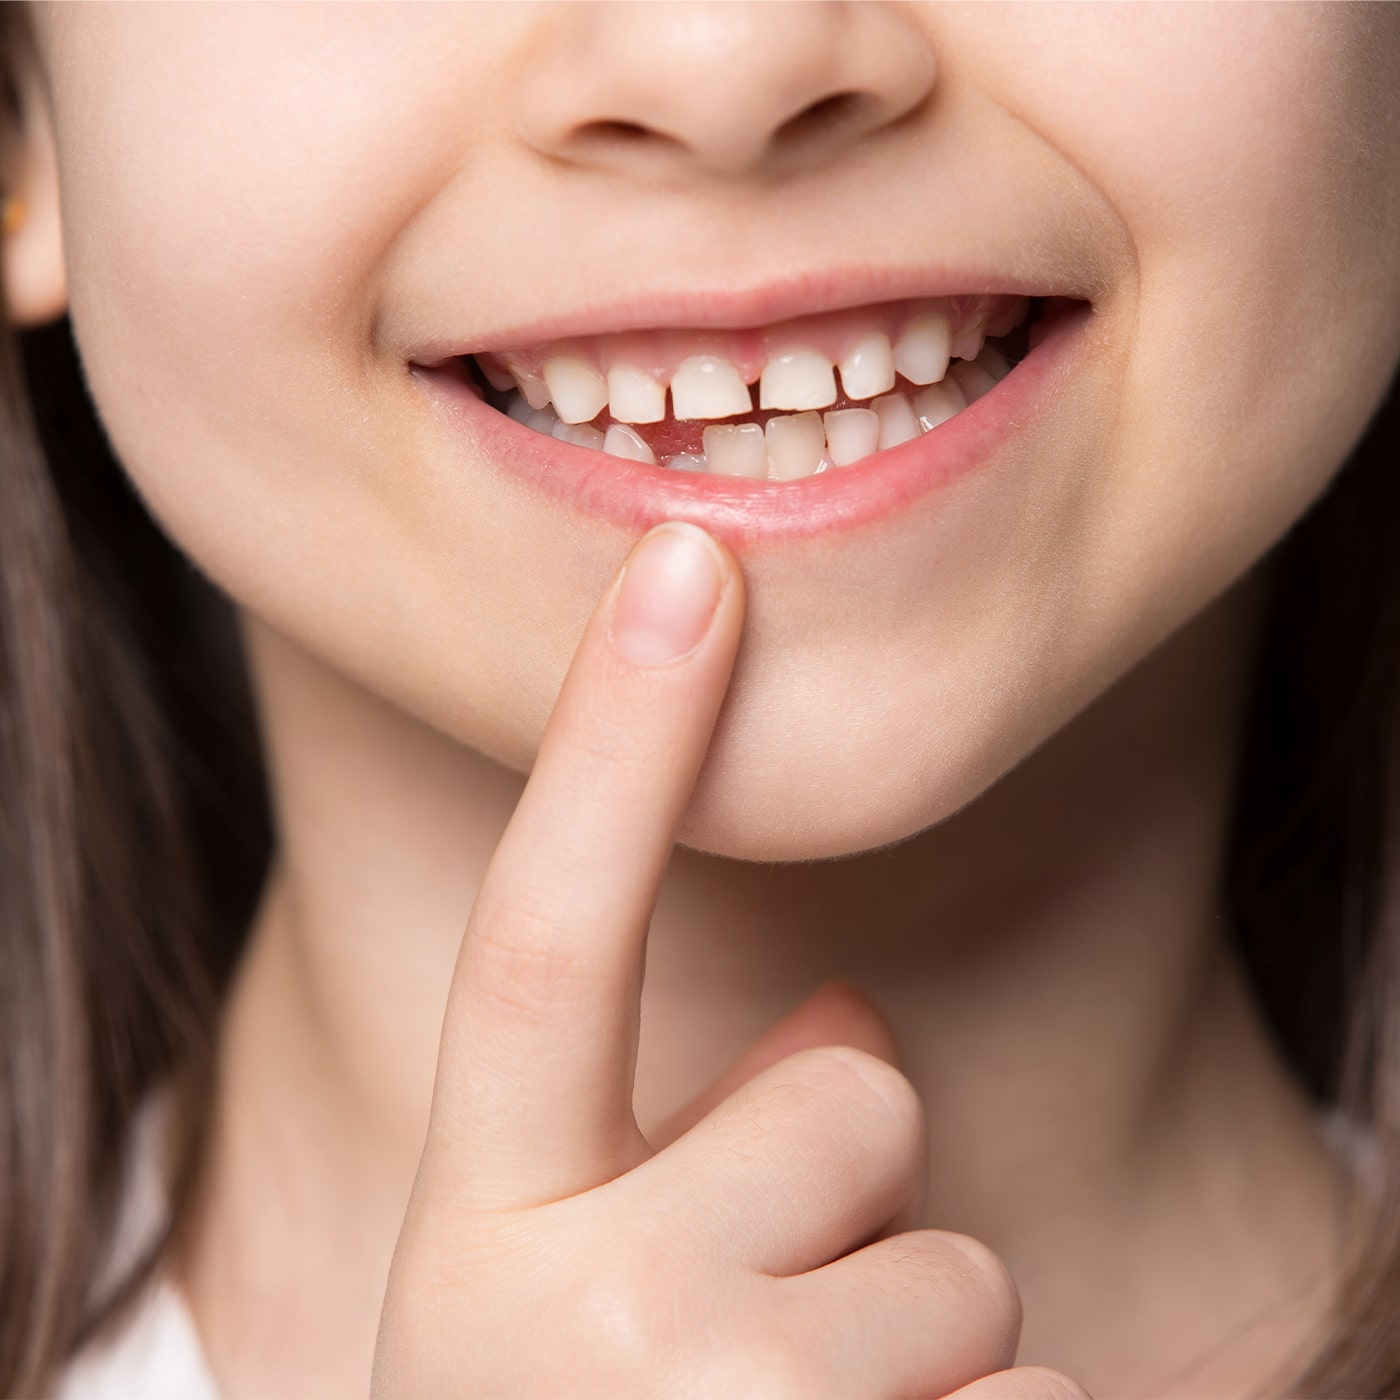 Niña muestra problema dental